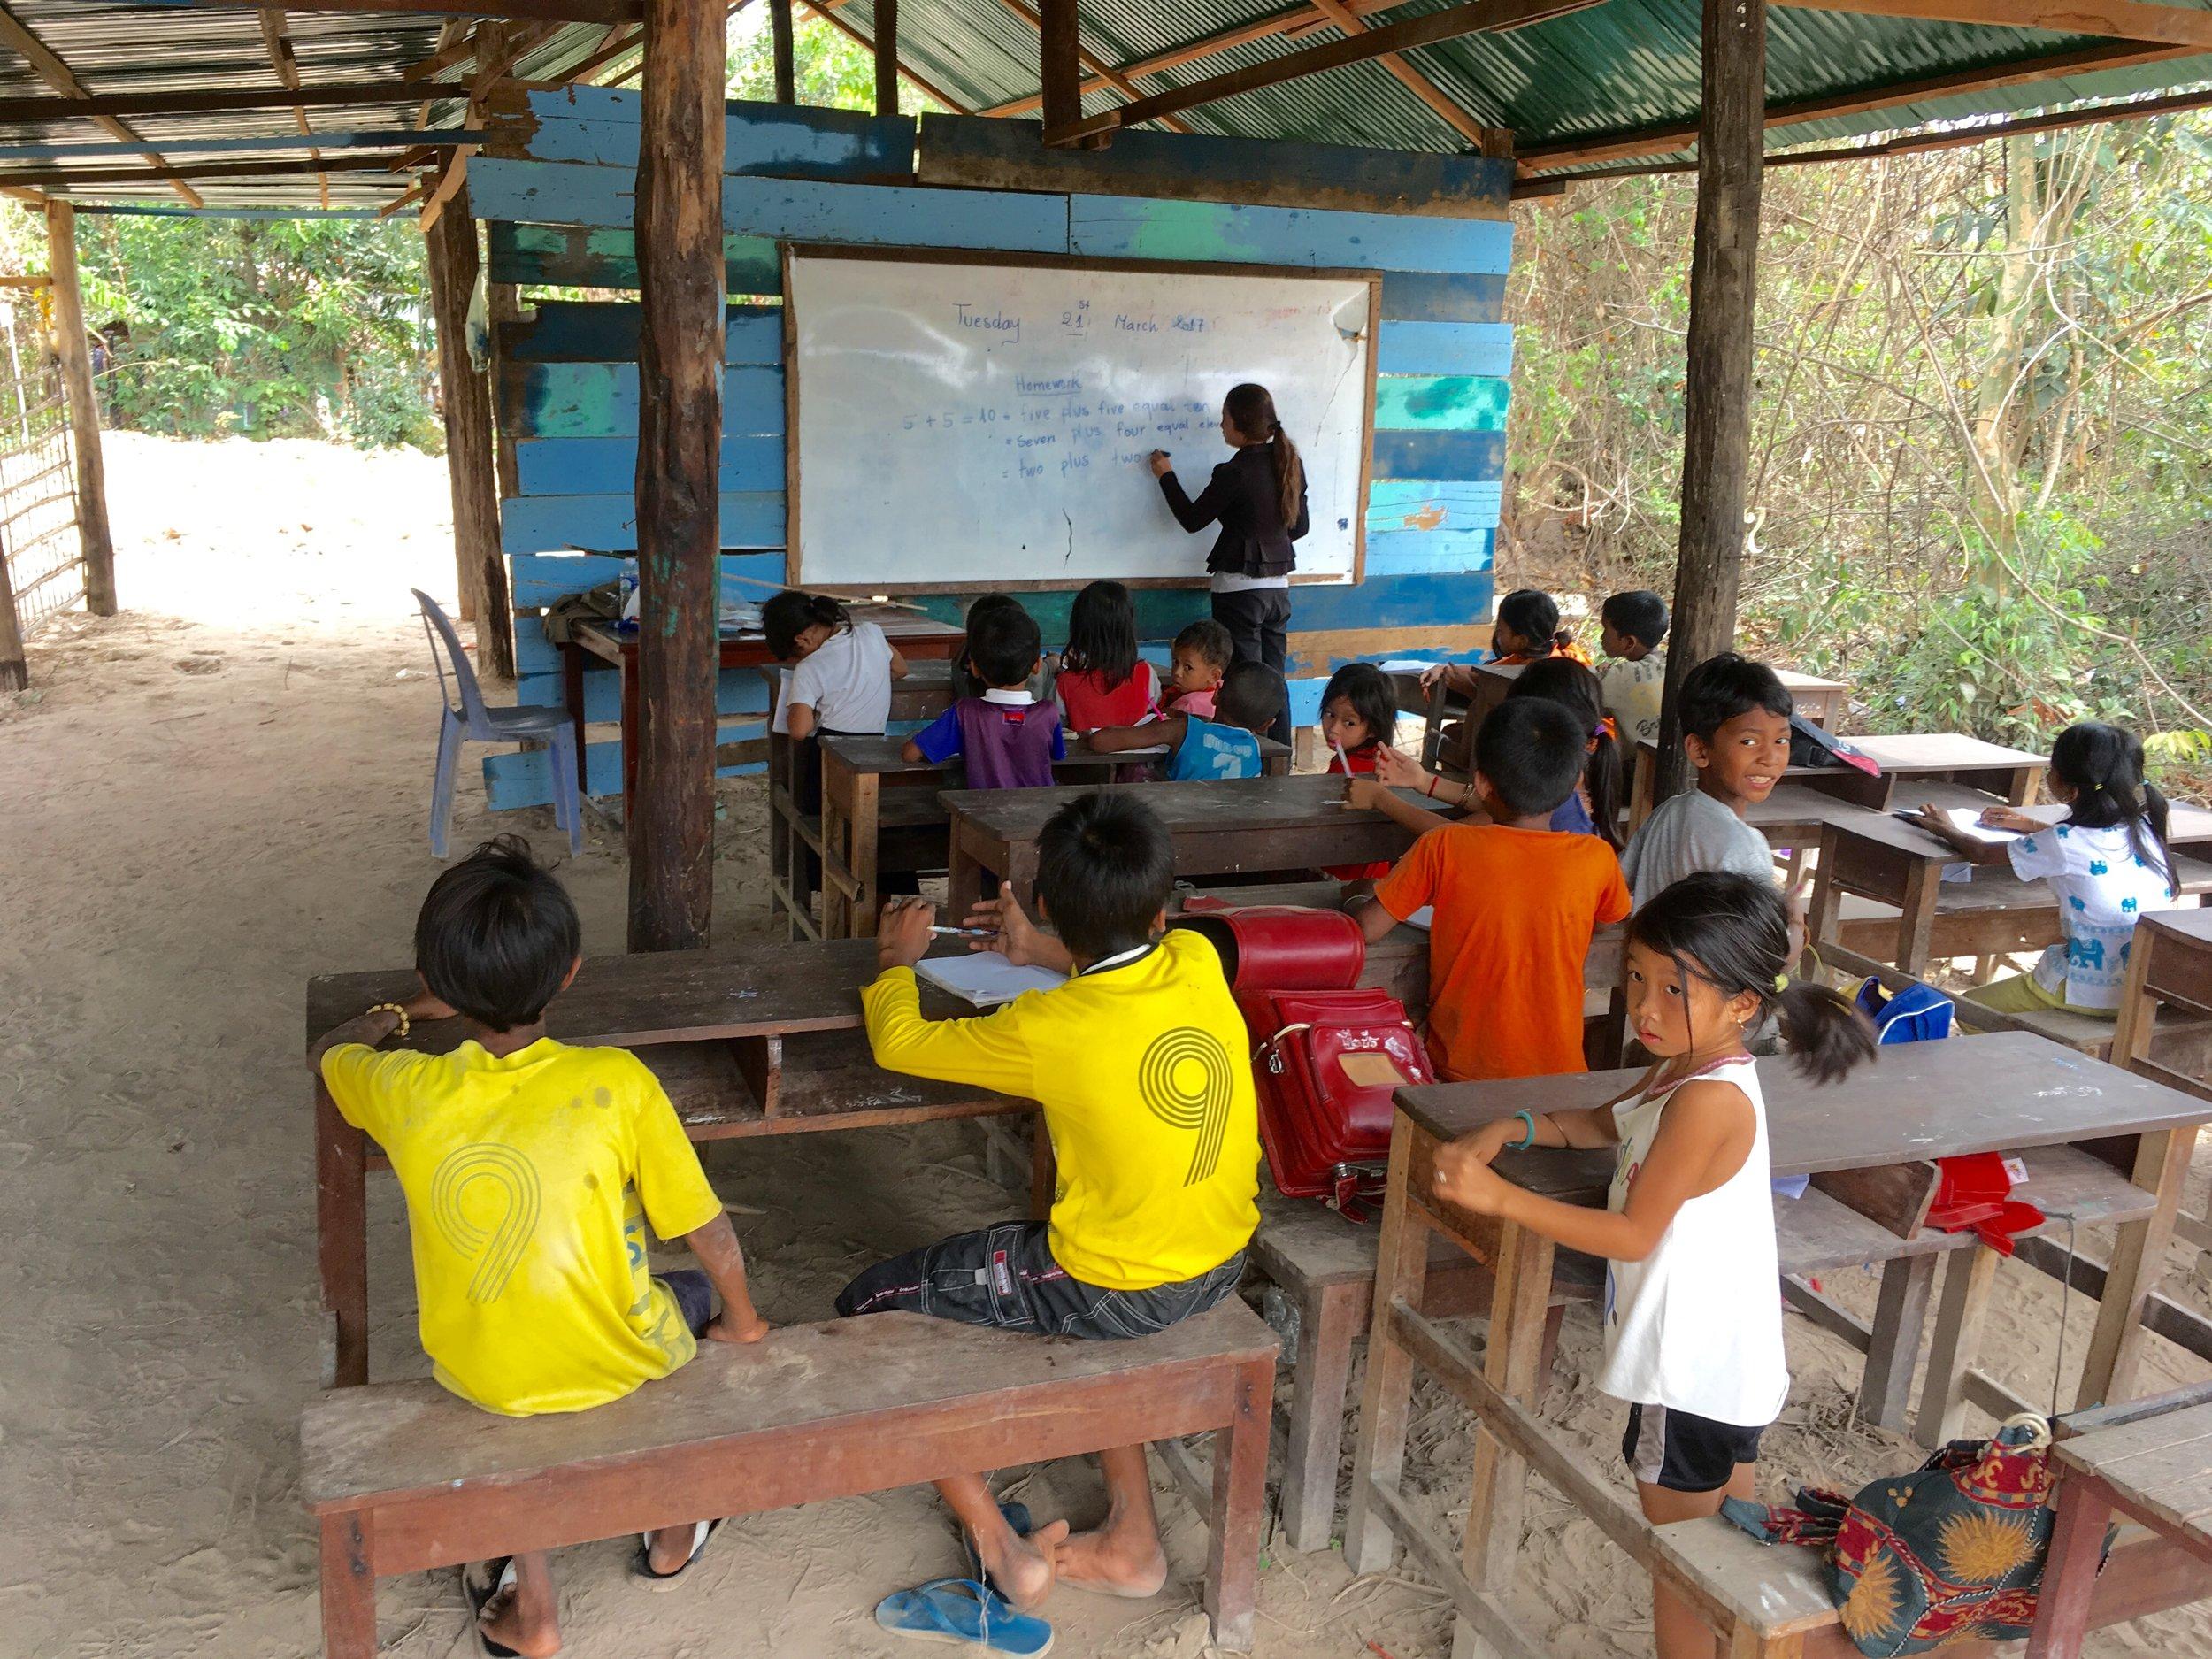 New Bridge School, Siem Reap